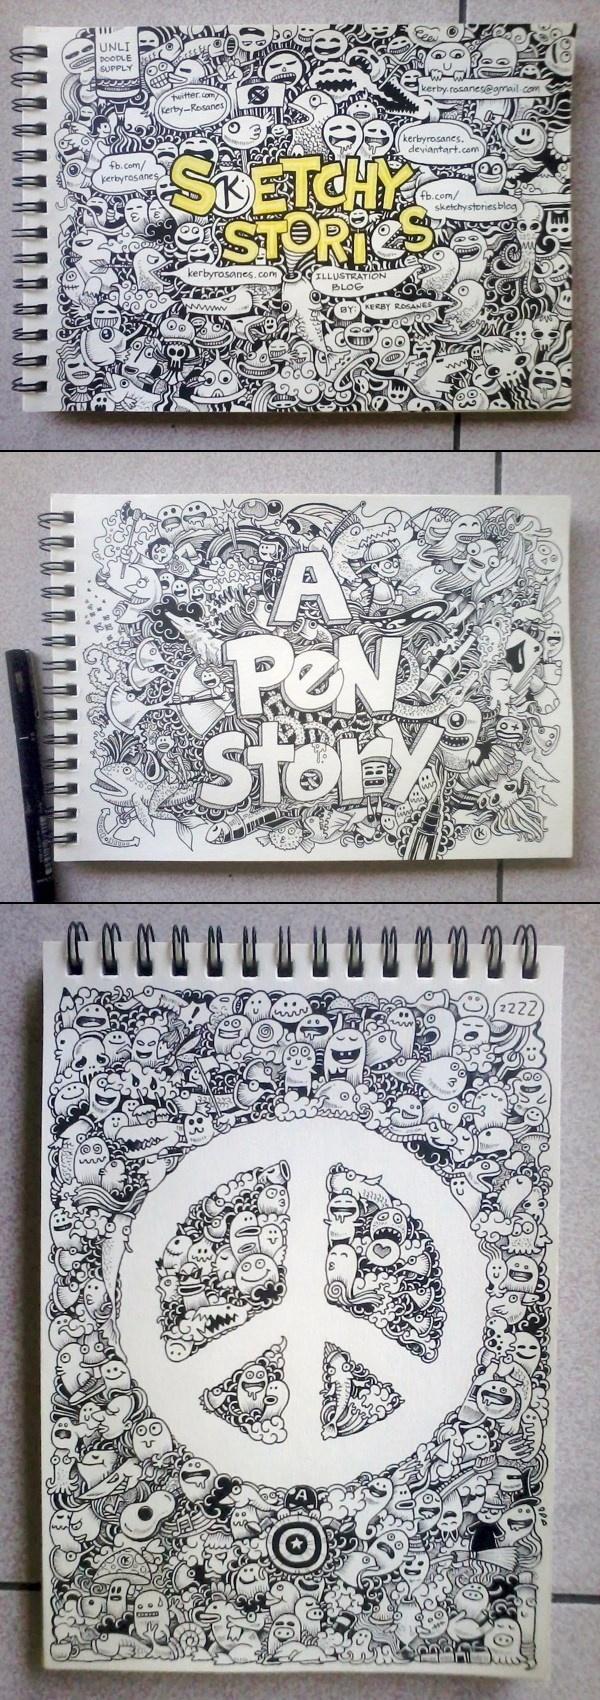 Kerby Rosanes→Random Doodles 2012 (Part One)  Drawing, Illustration